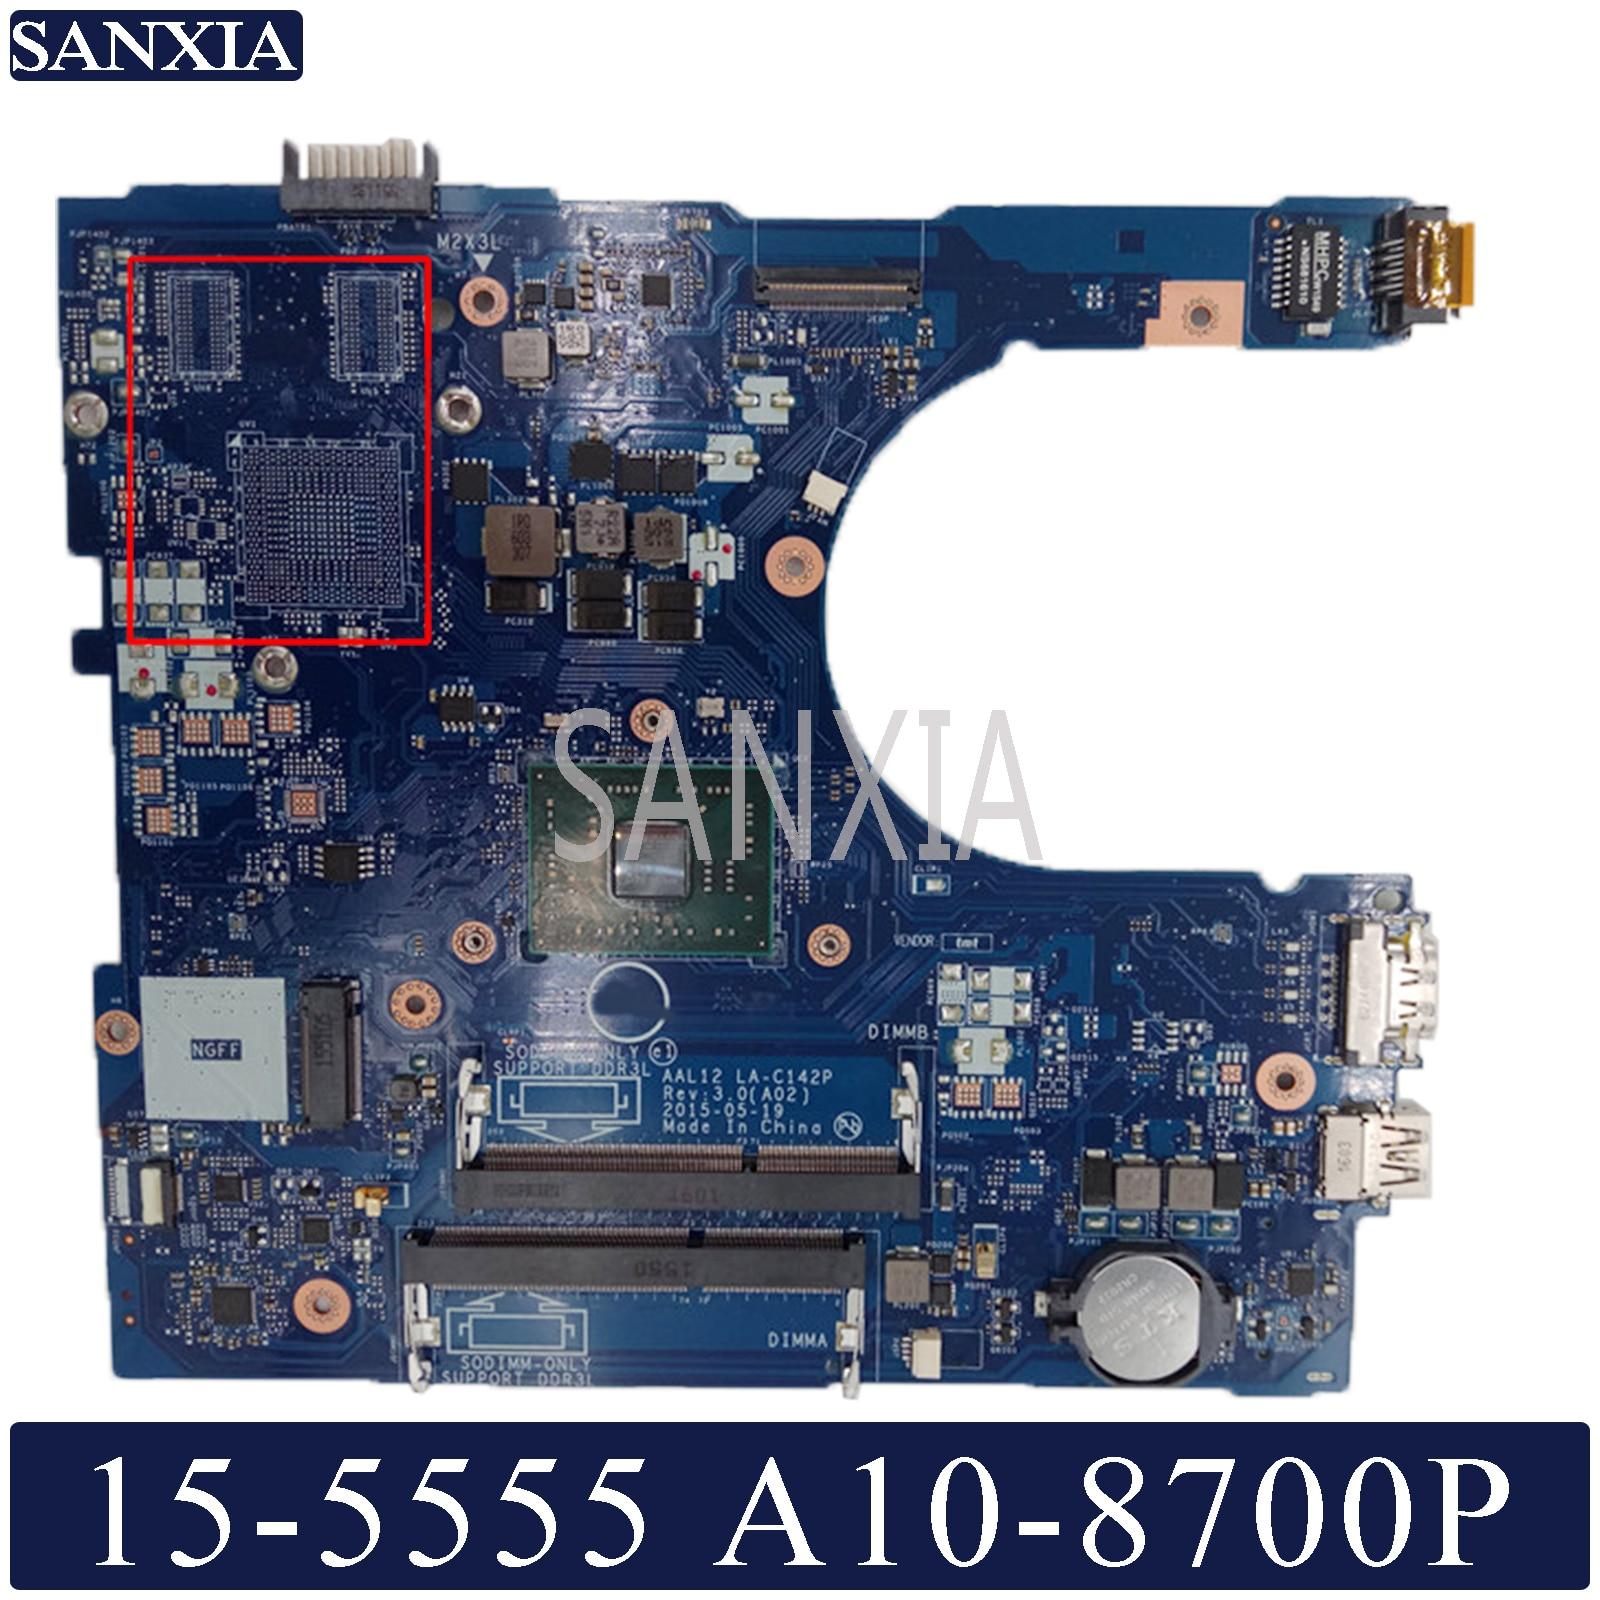 KEFU LA-C142P Laptop Motherboard For Dell Inspiron 15-5555 14-5455 Original Mainboard A10-8700P